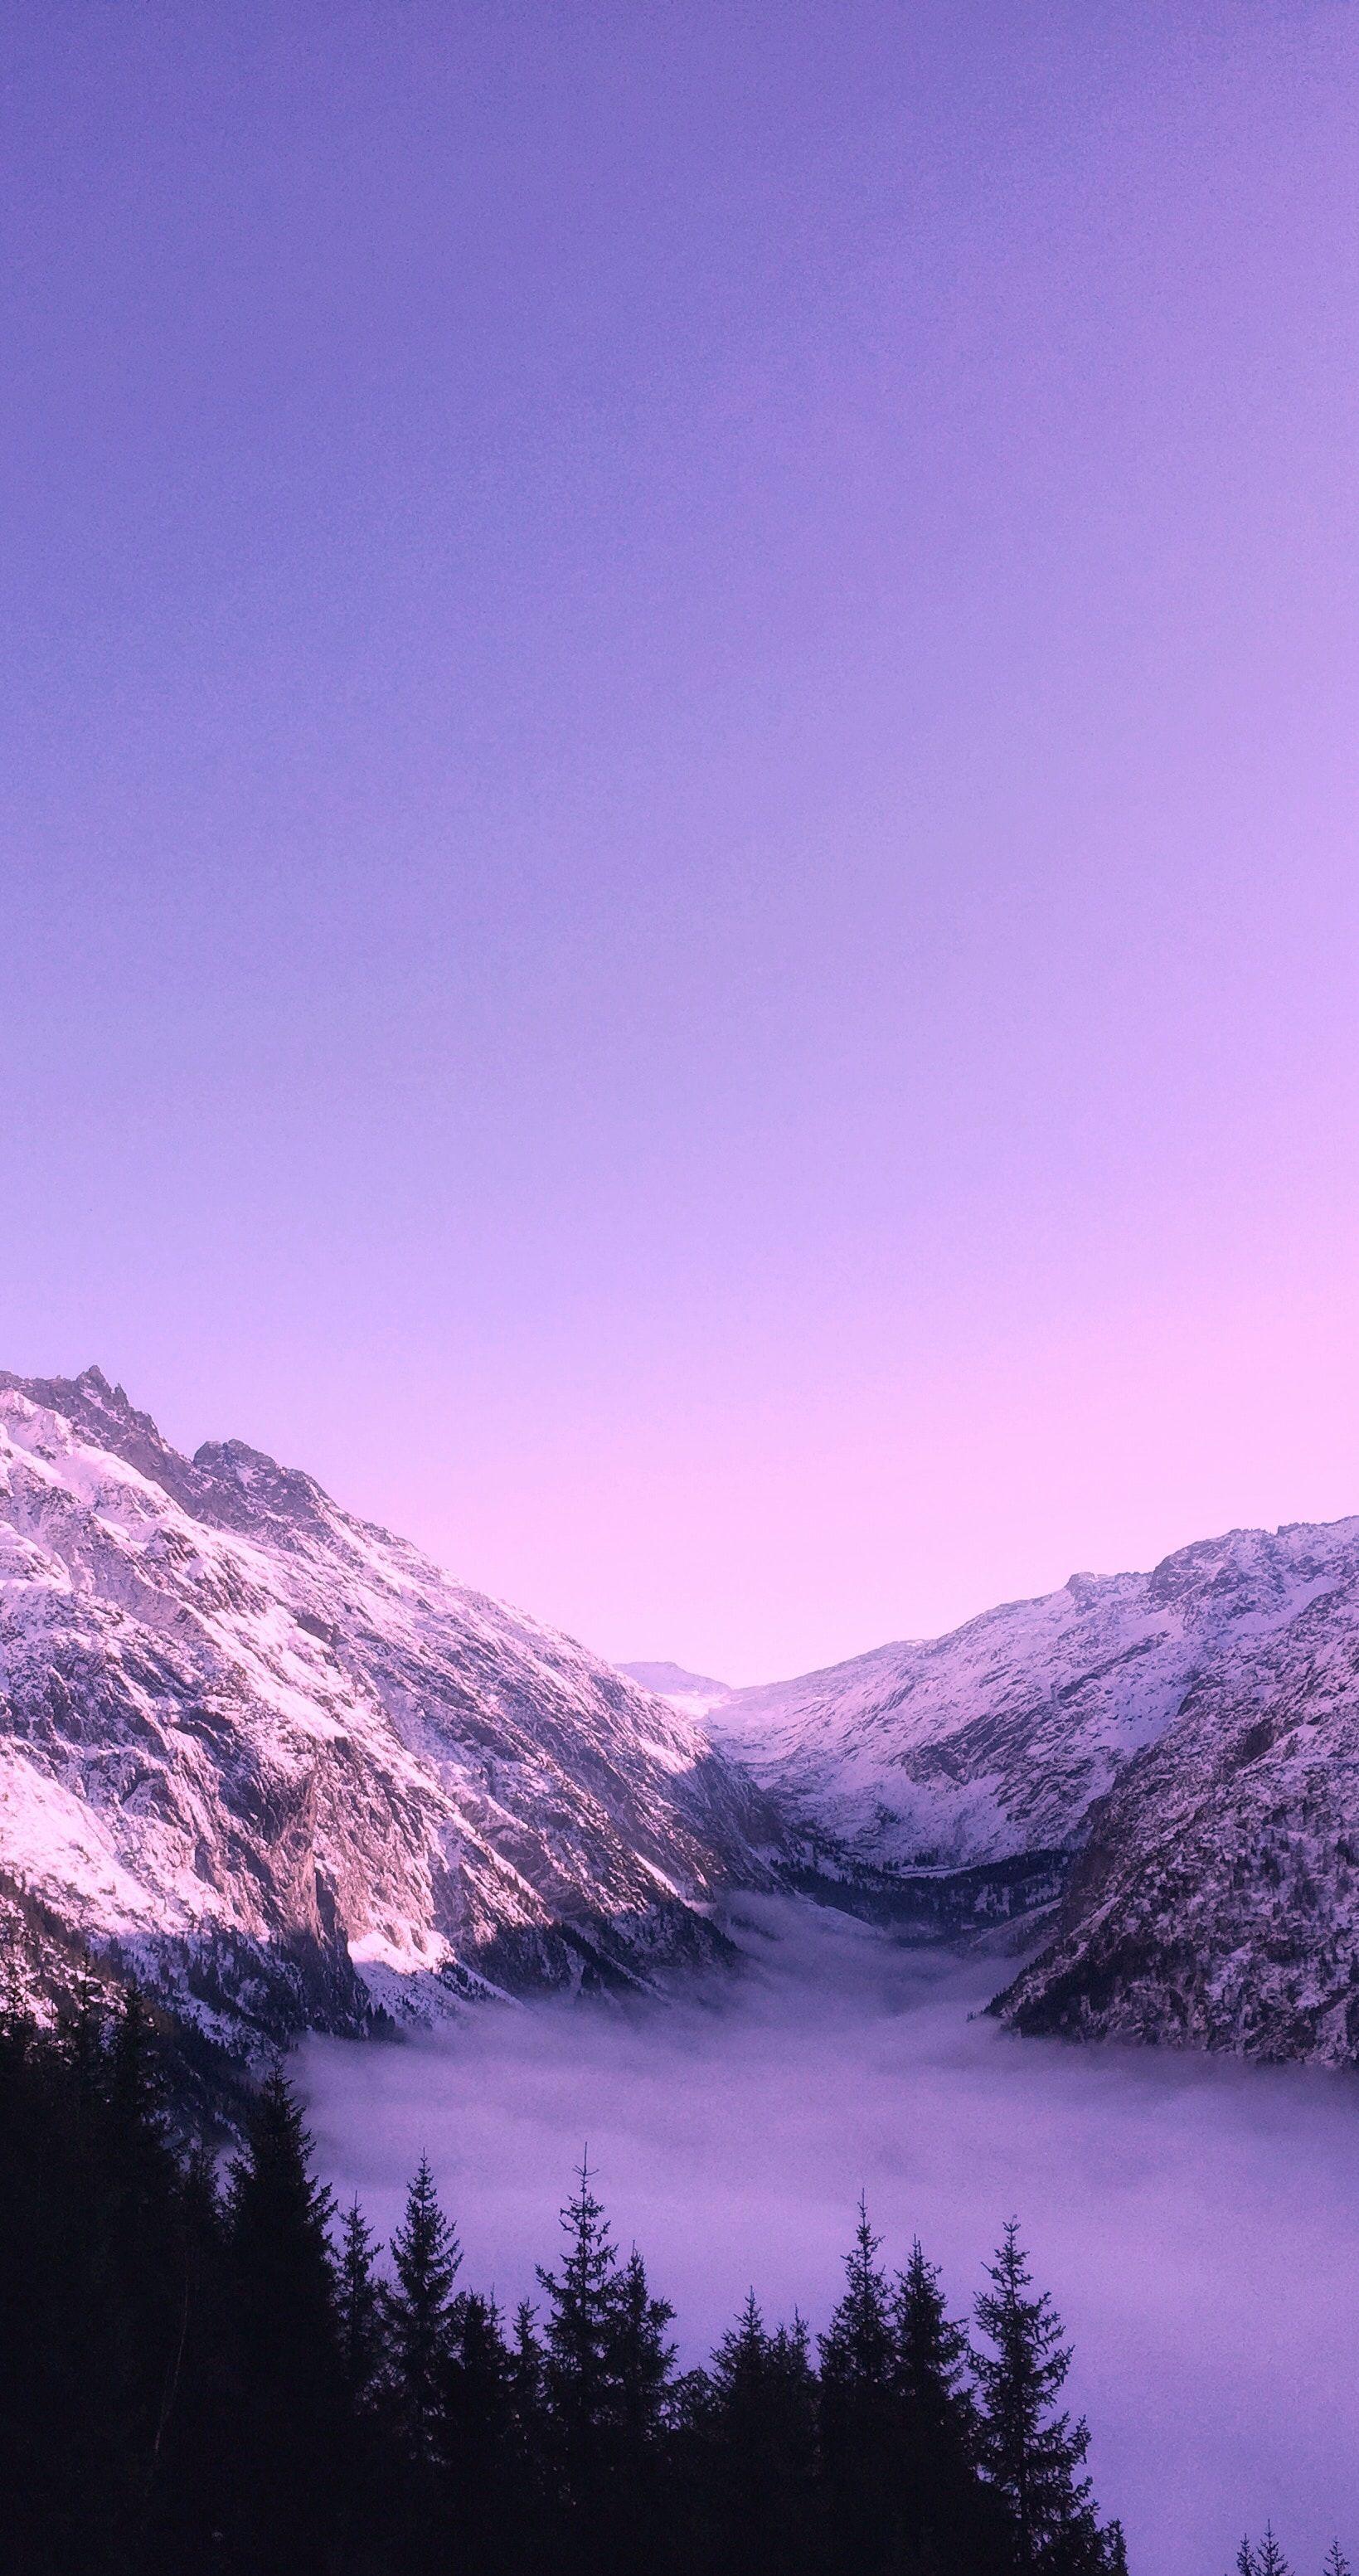 Beautiful Landscape With Purple Mountain Majesty Purple Purpleaesthetic Dusk Landscape Photography Purple Wallpaper Phone Wallpaper